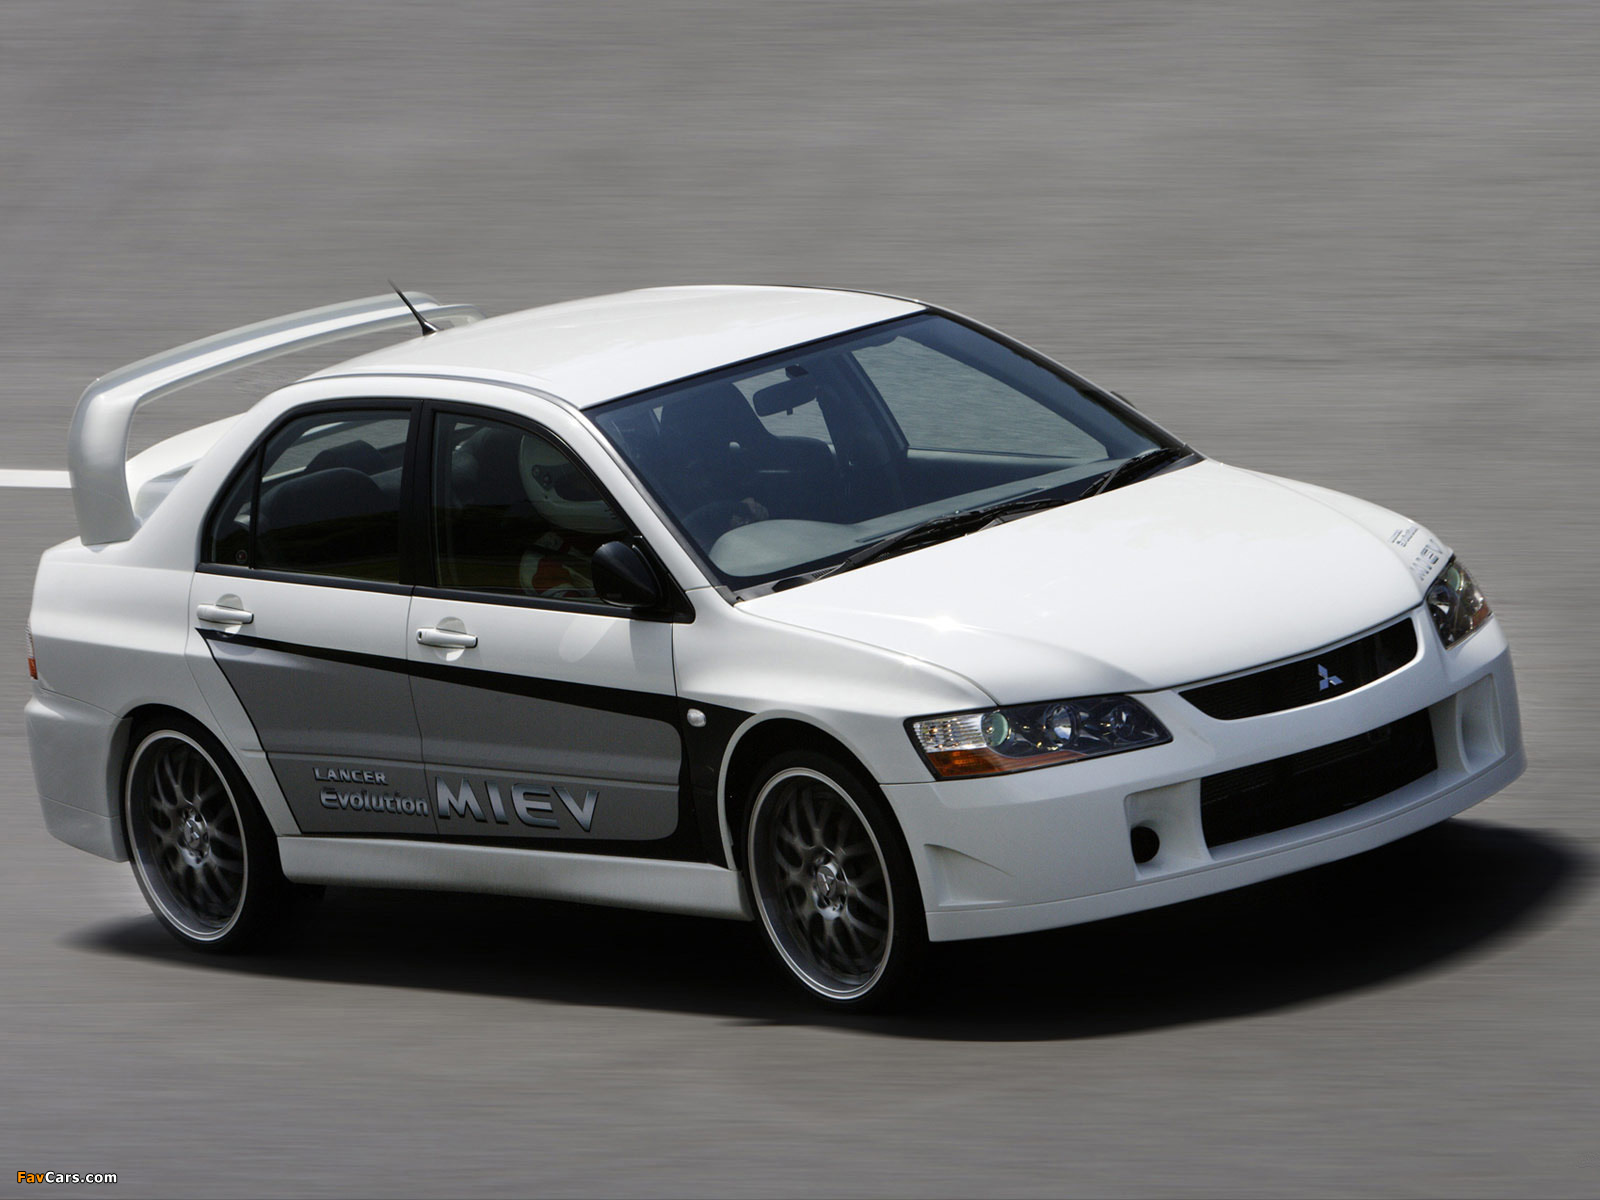 Mitsubishi Lancer Evolution MIEV Concept 2005 photos (1600 x 1200)